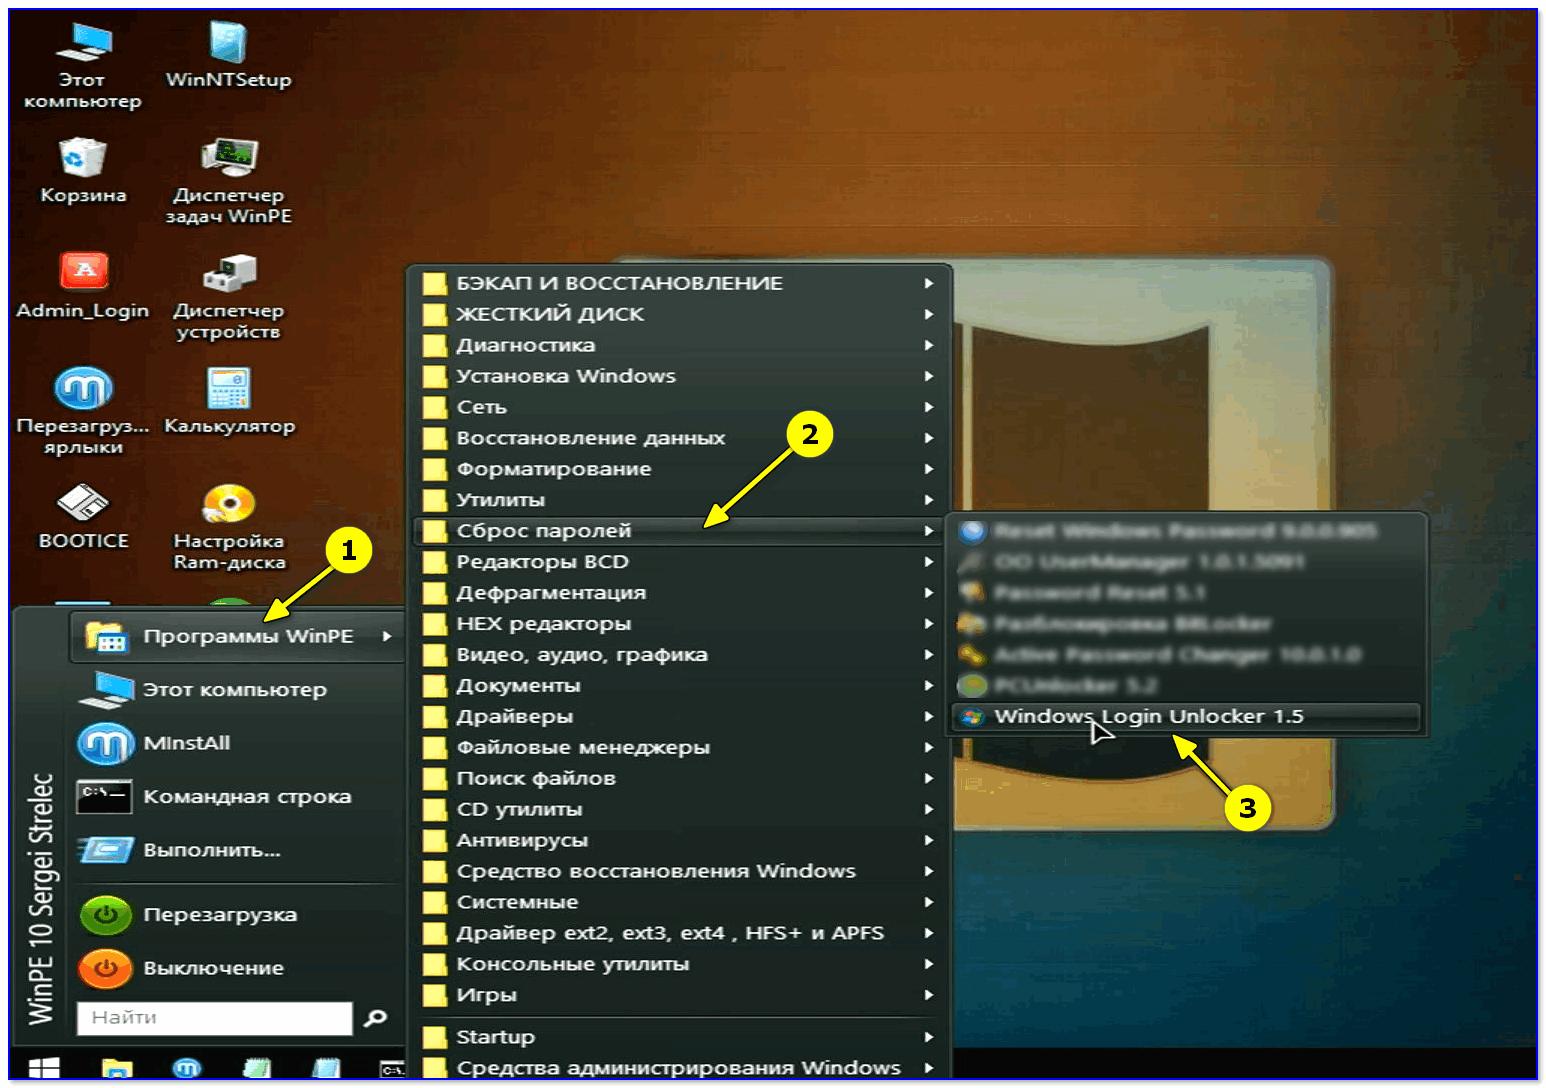 Windows login Unlocker — загрузочная флешка от Стрельца